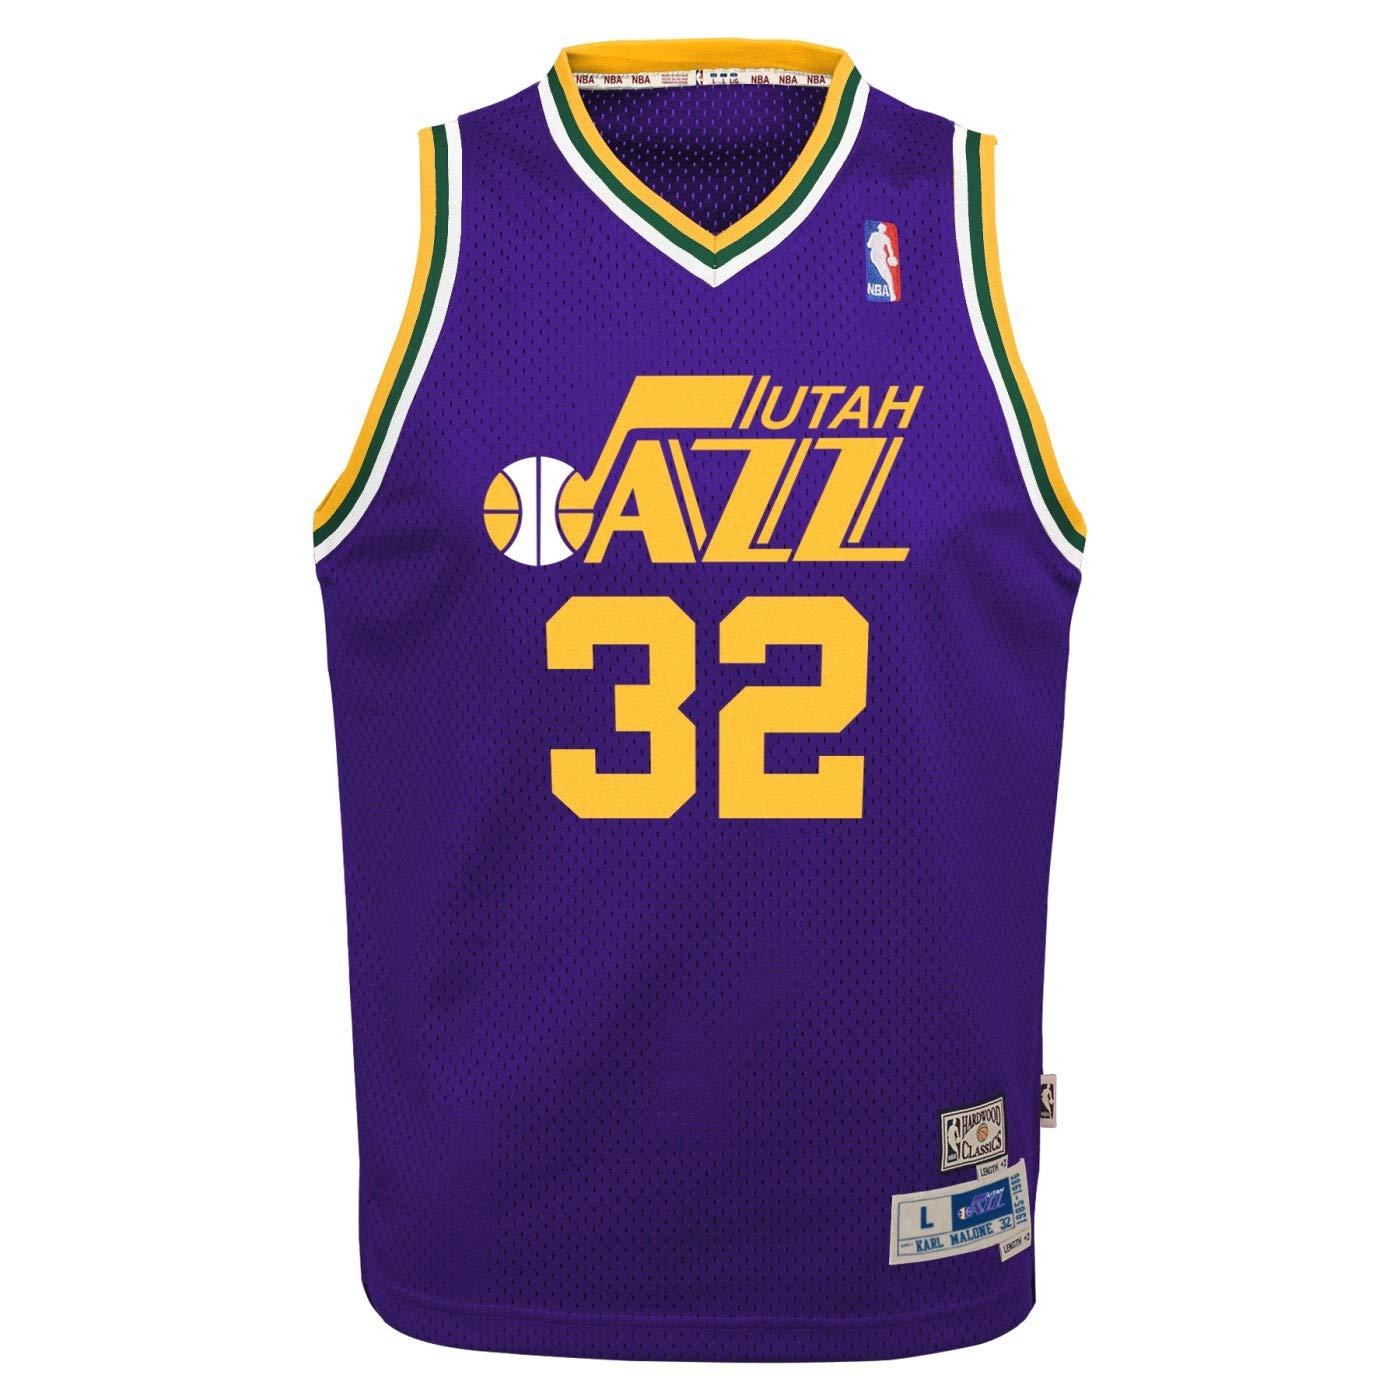 a0436820c Amazon.com : Outerstuff Karl Malone Utah Jazz NBA Youth Throwback Swingman  Jersey : Sports & Outdoors